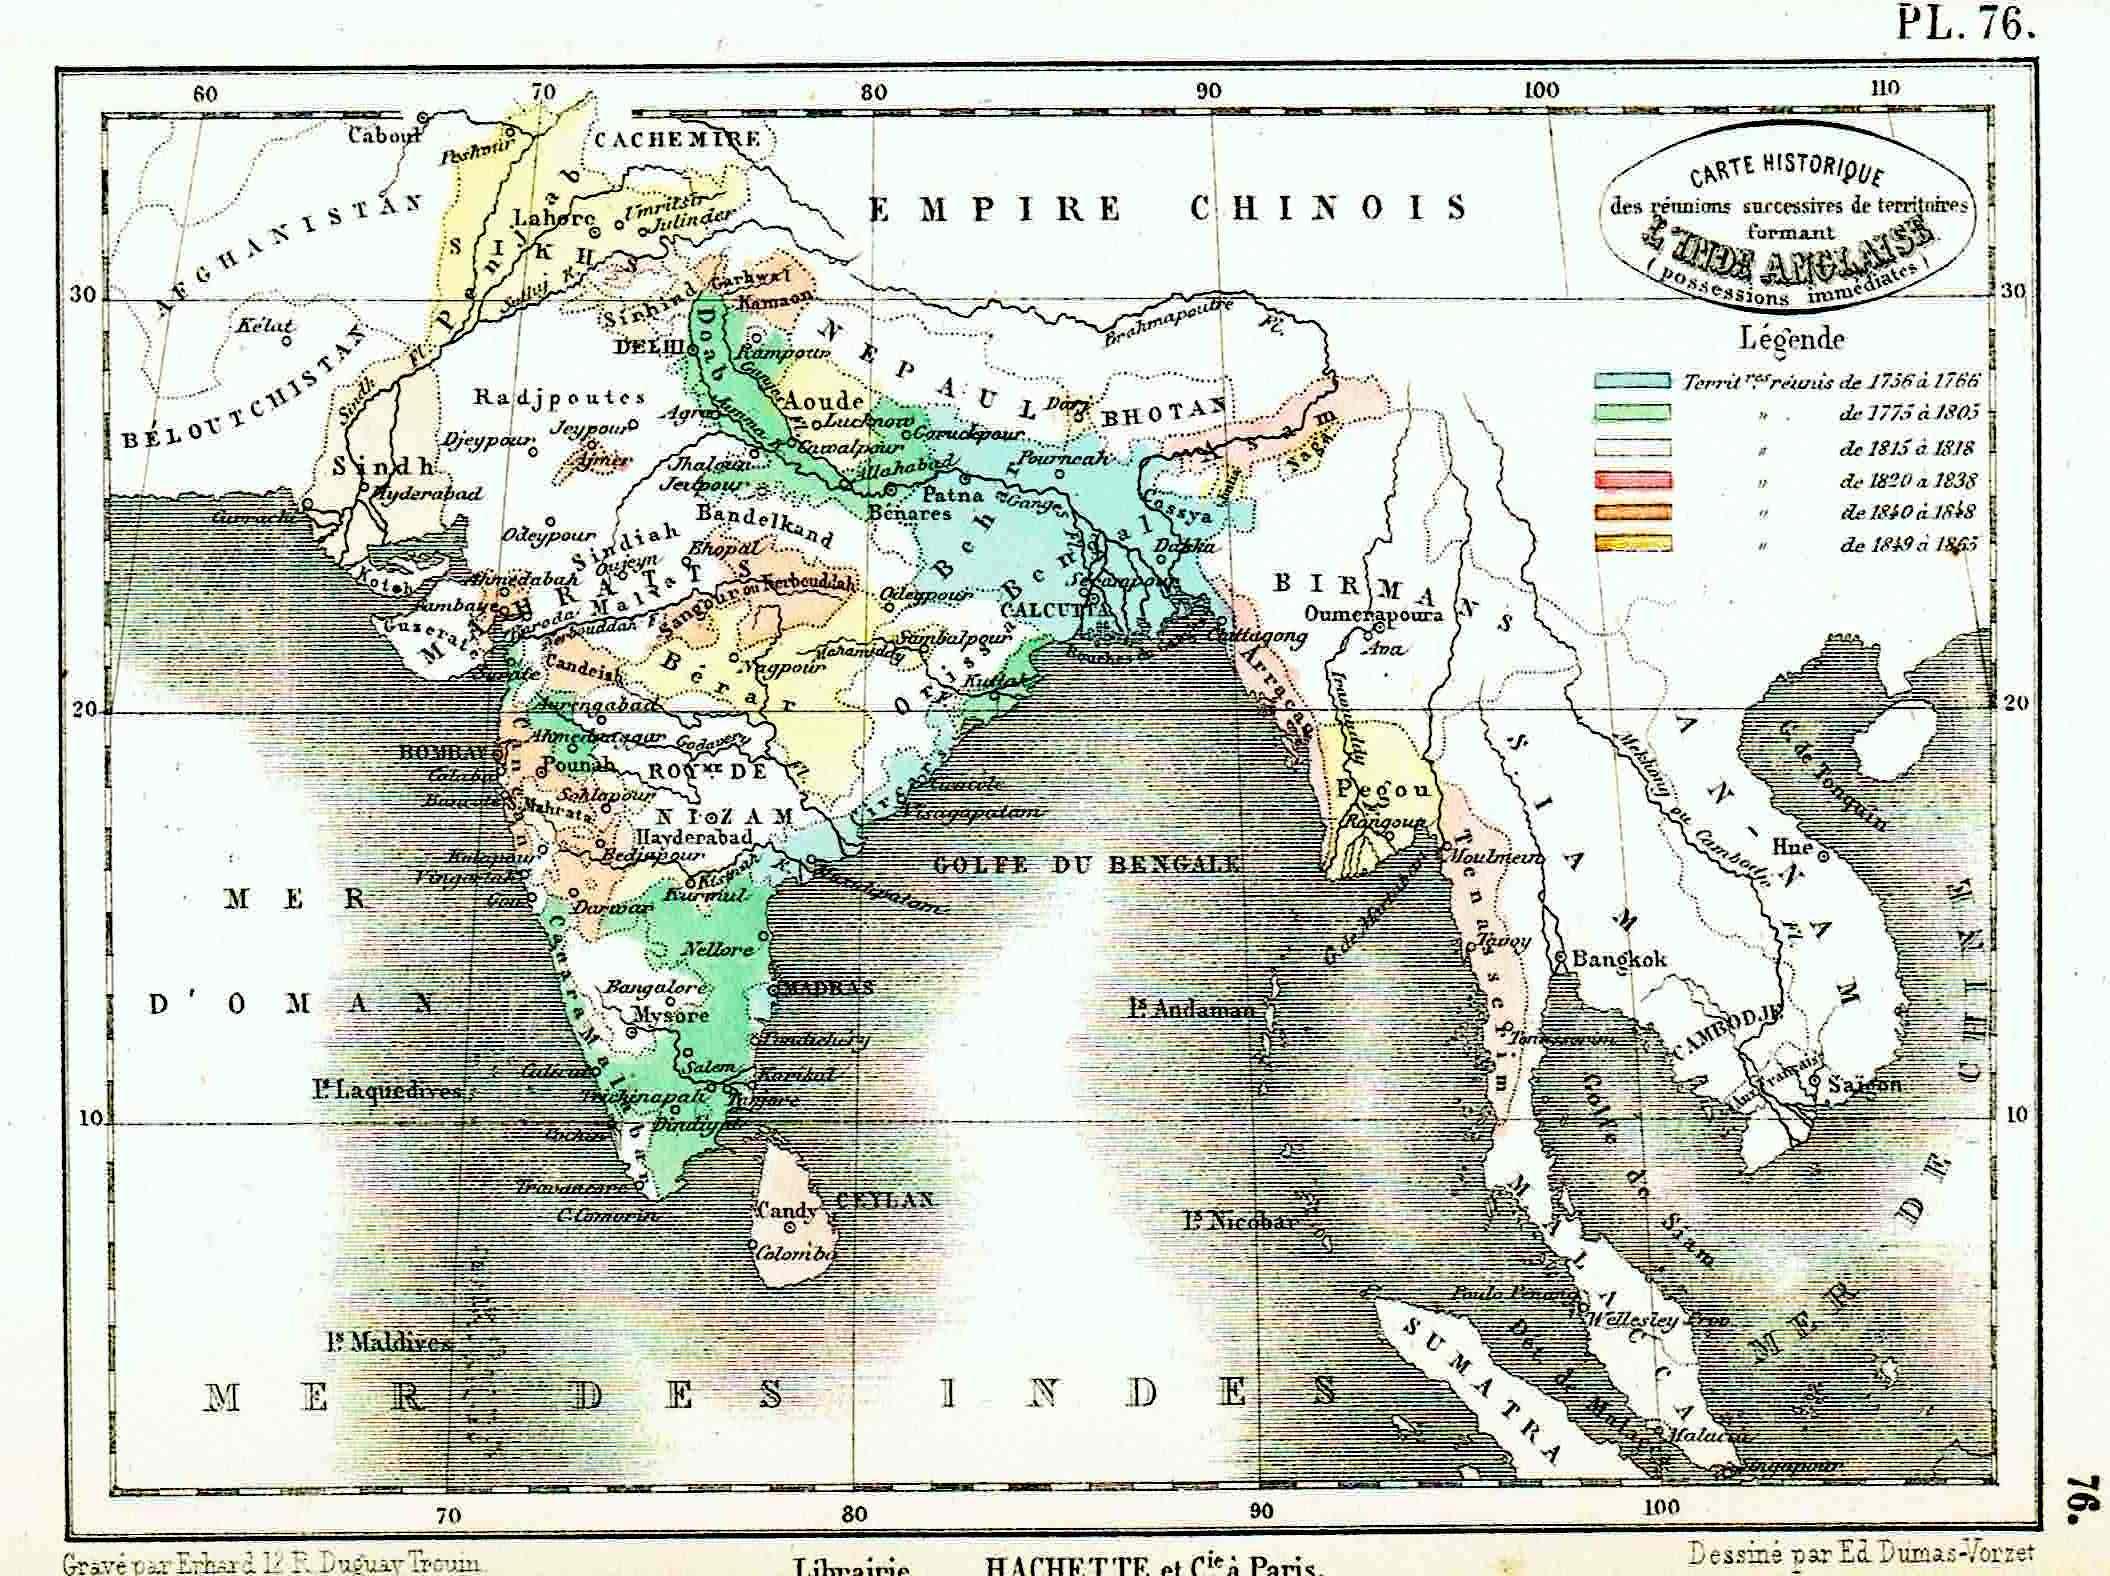 india inglese storica vorzet